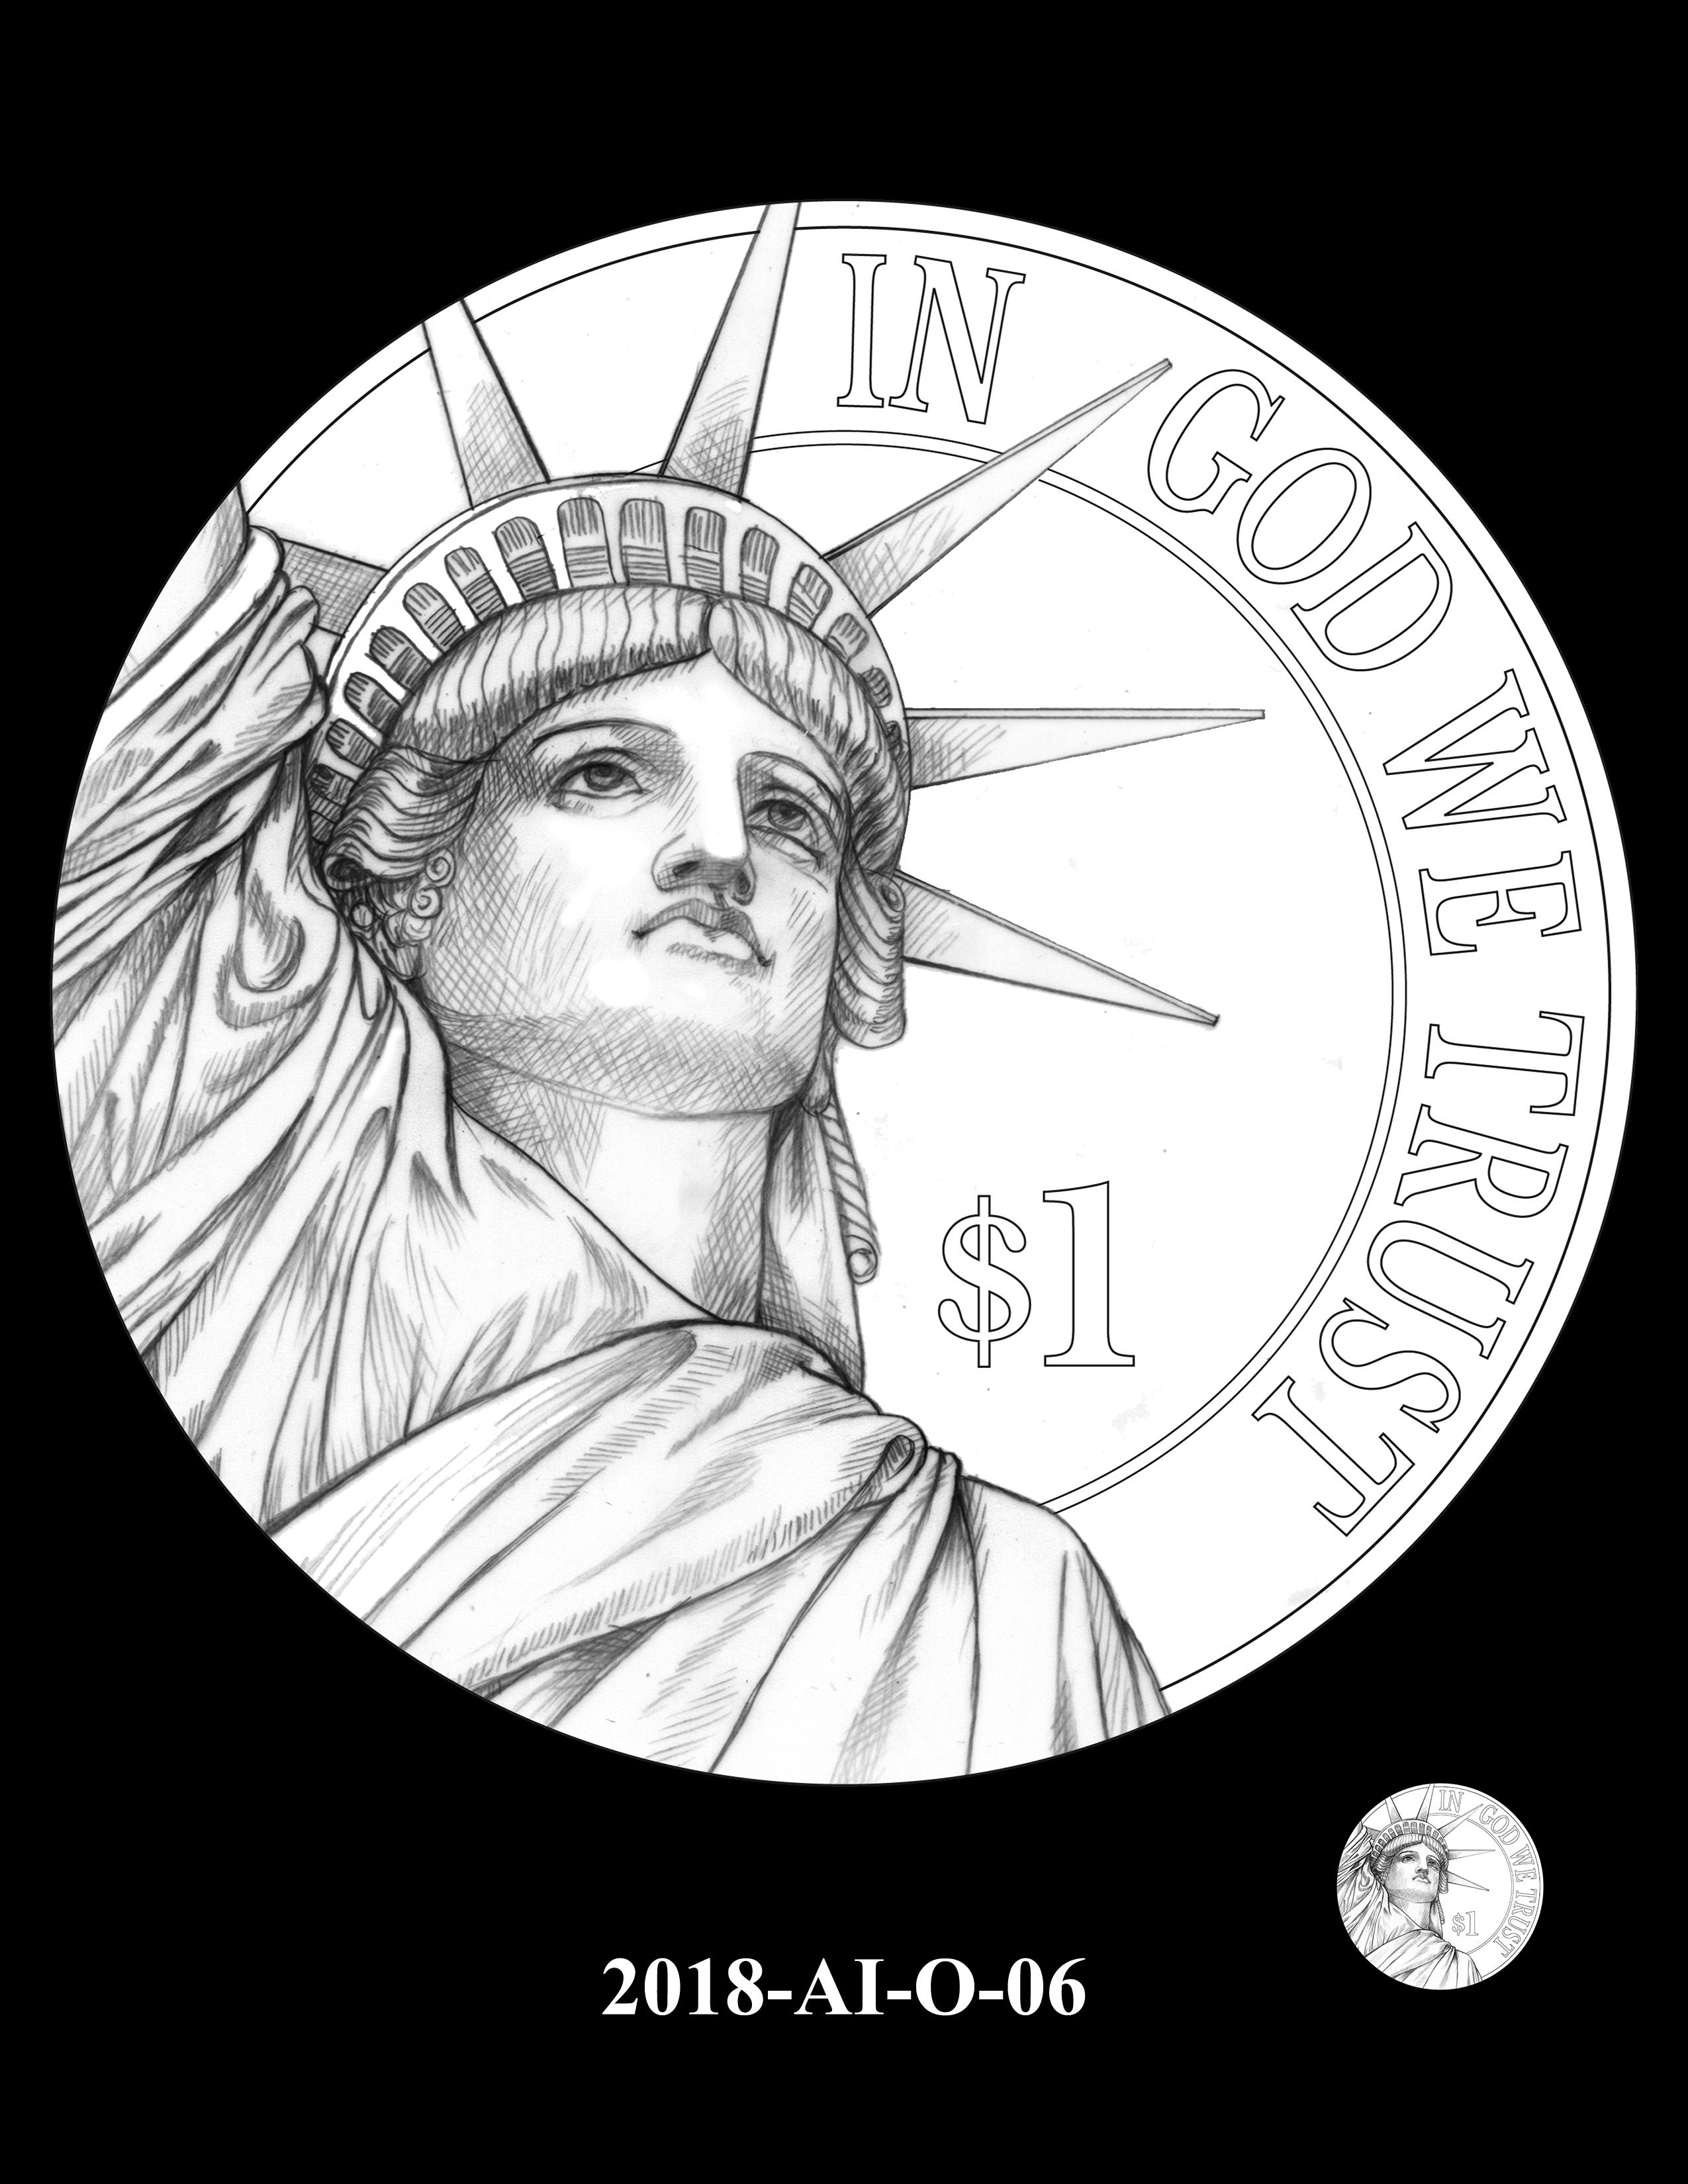 2018-AI-O-06 -- 2018 American Innovation $1 Coin